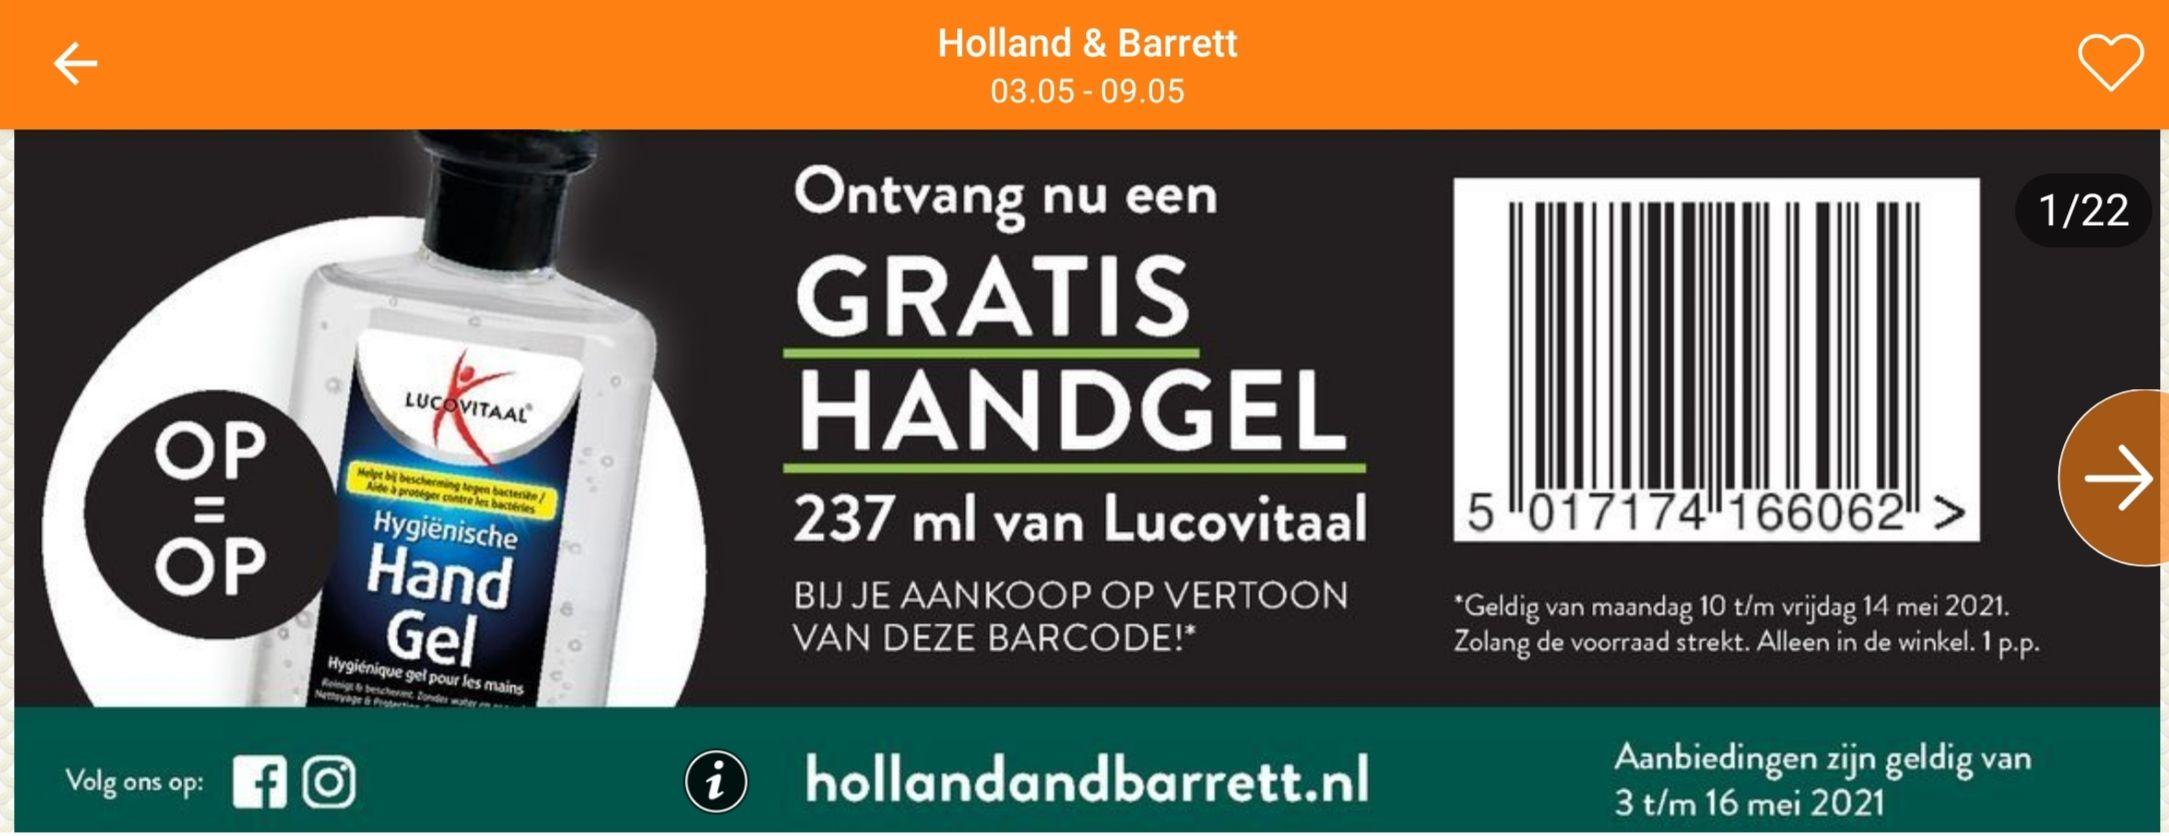 Gratis handgel 237 ml van Lucovitaal @Holland & Barrett